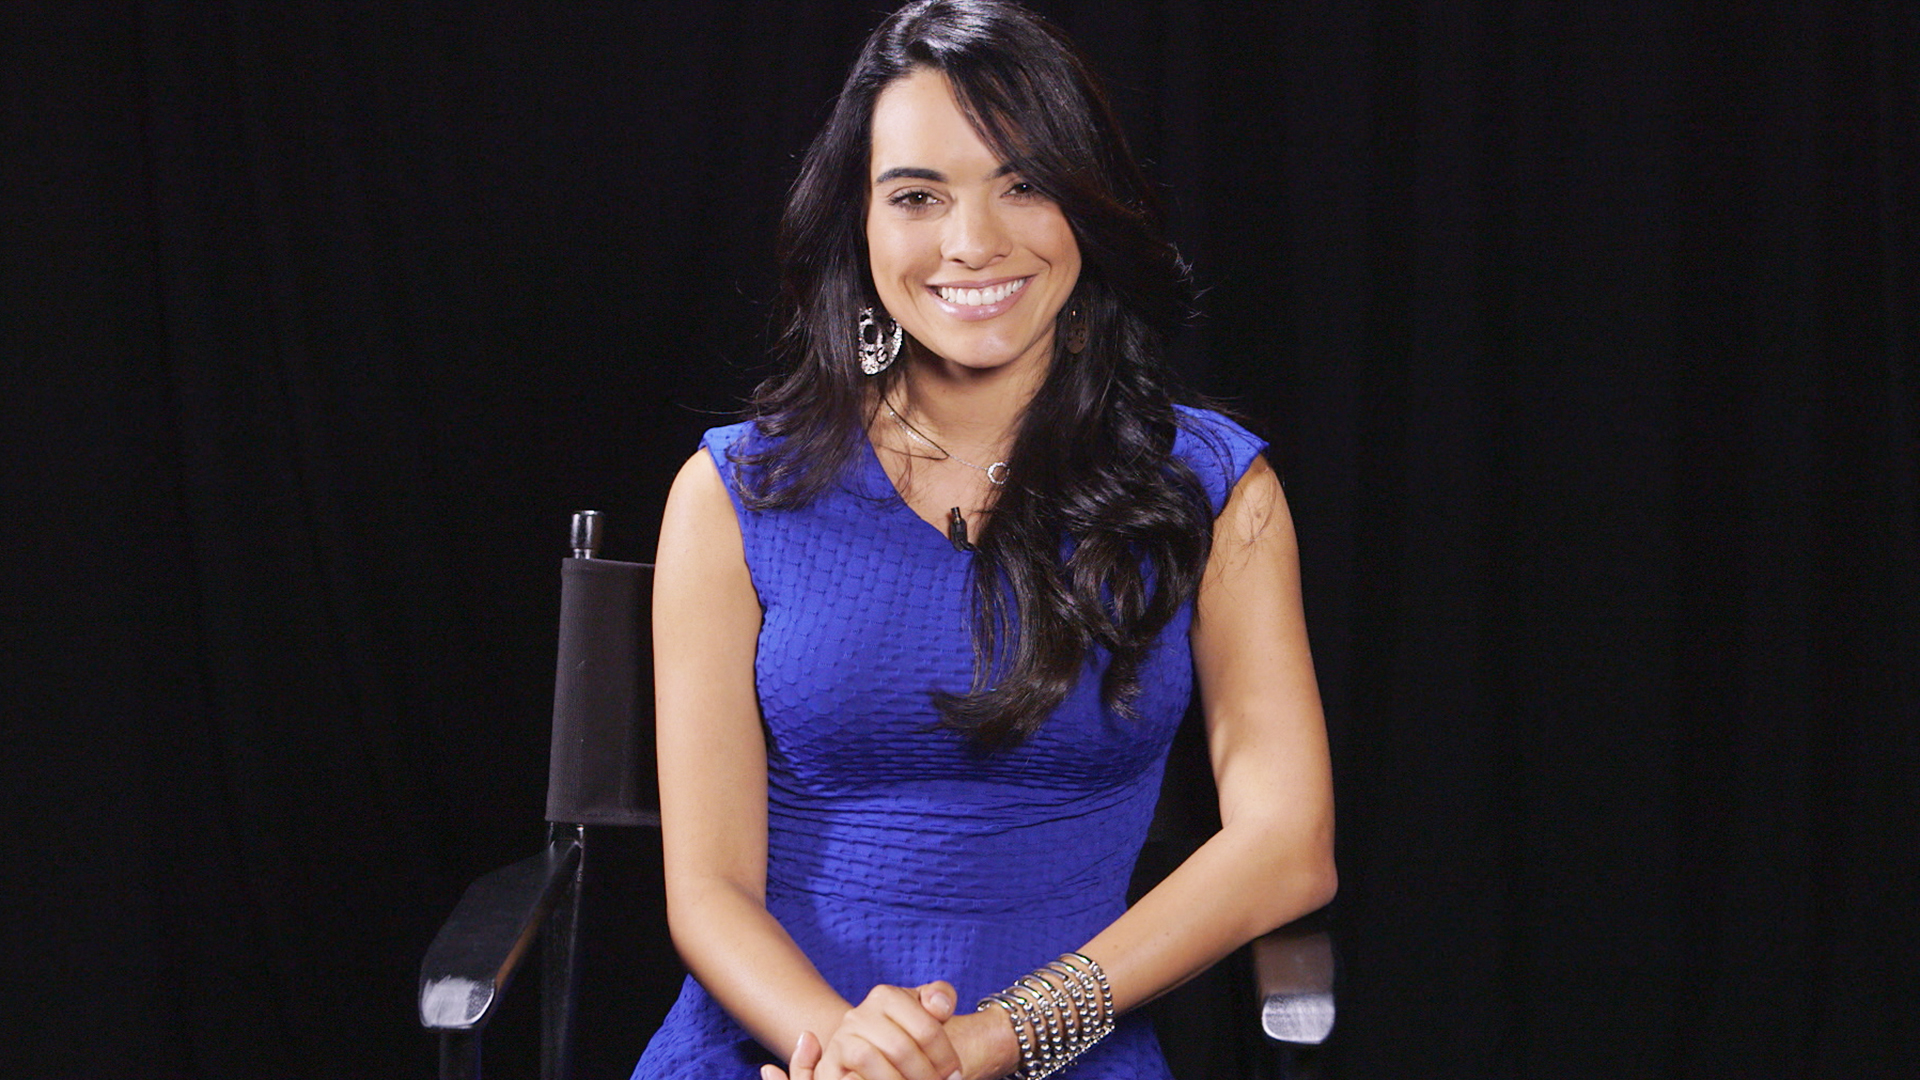 http://www.telemundo.com/sites/nbcutelemundo/files/images/promo/video_clip/2014/11/17/scarlet-gruber-vestido-azul.jpg